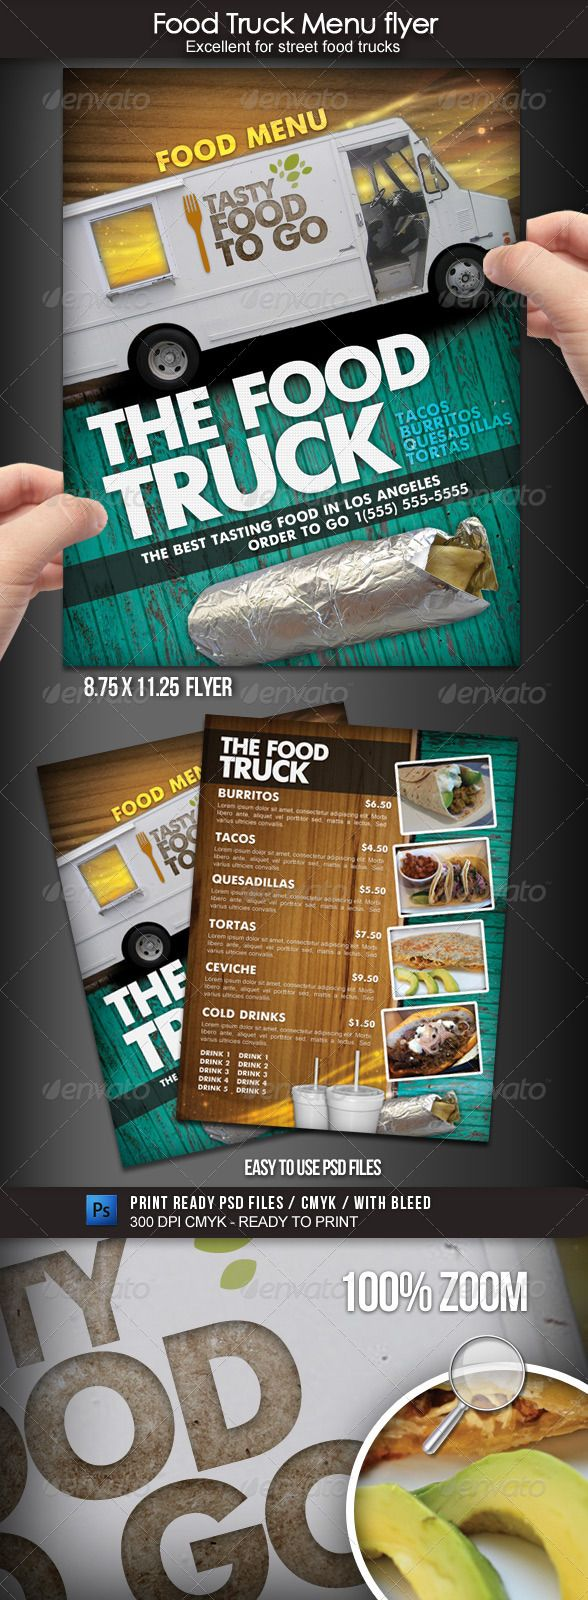 Food Truck Menu Flyer   Food truck menu, Menu printing and Food truck